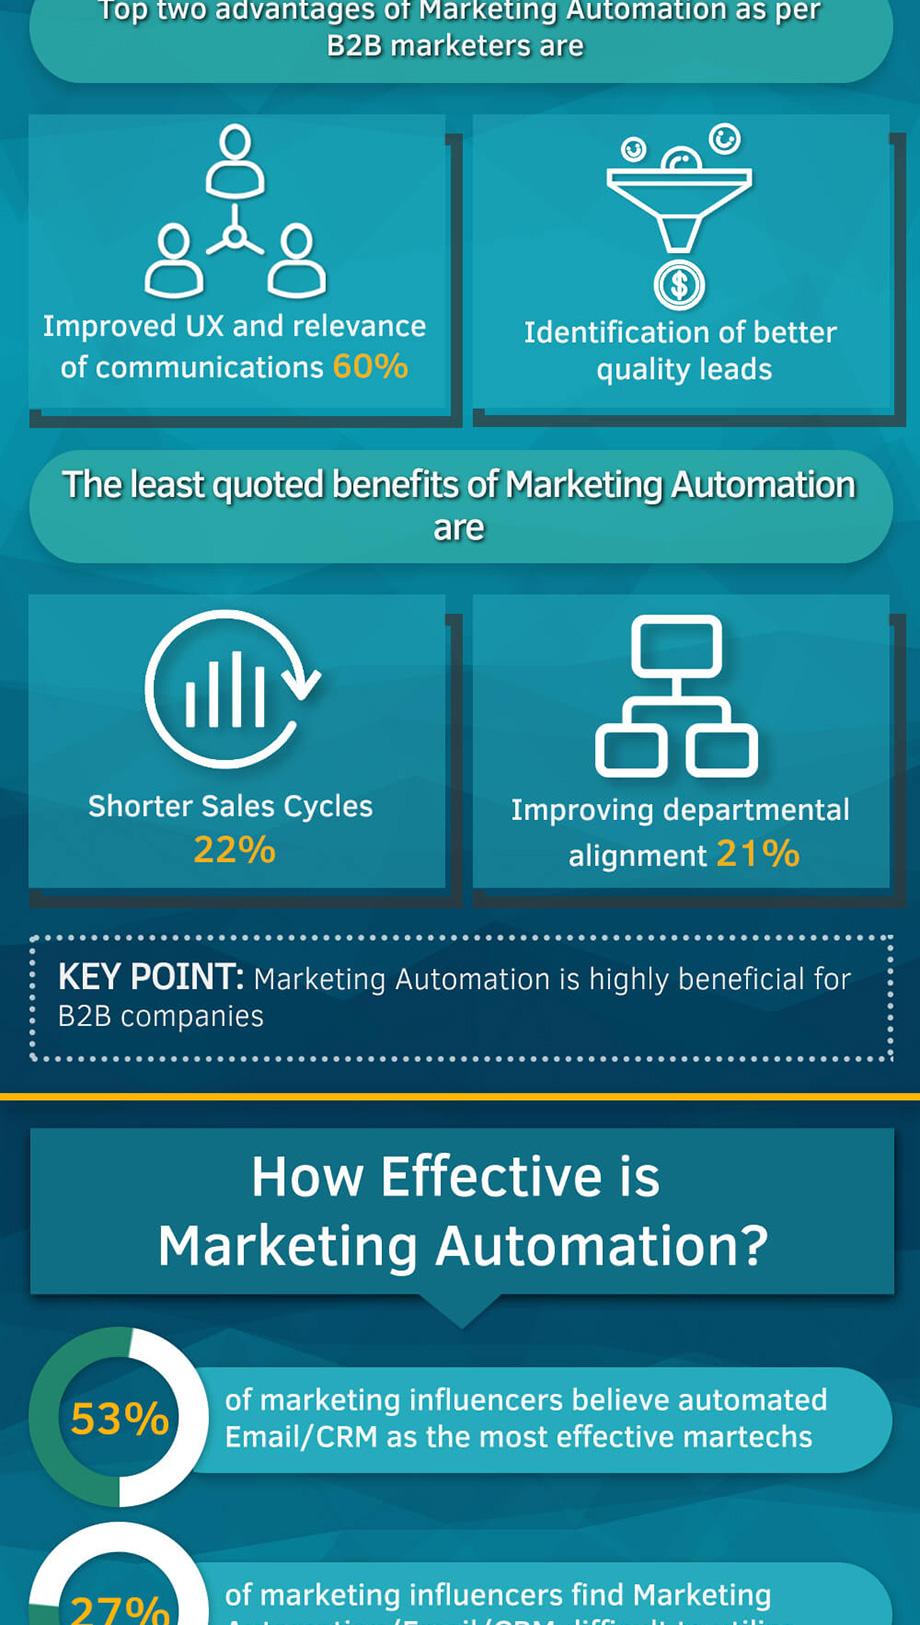 b2b-marketing-automation-role-infographic-3